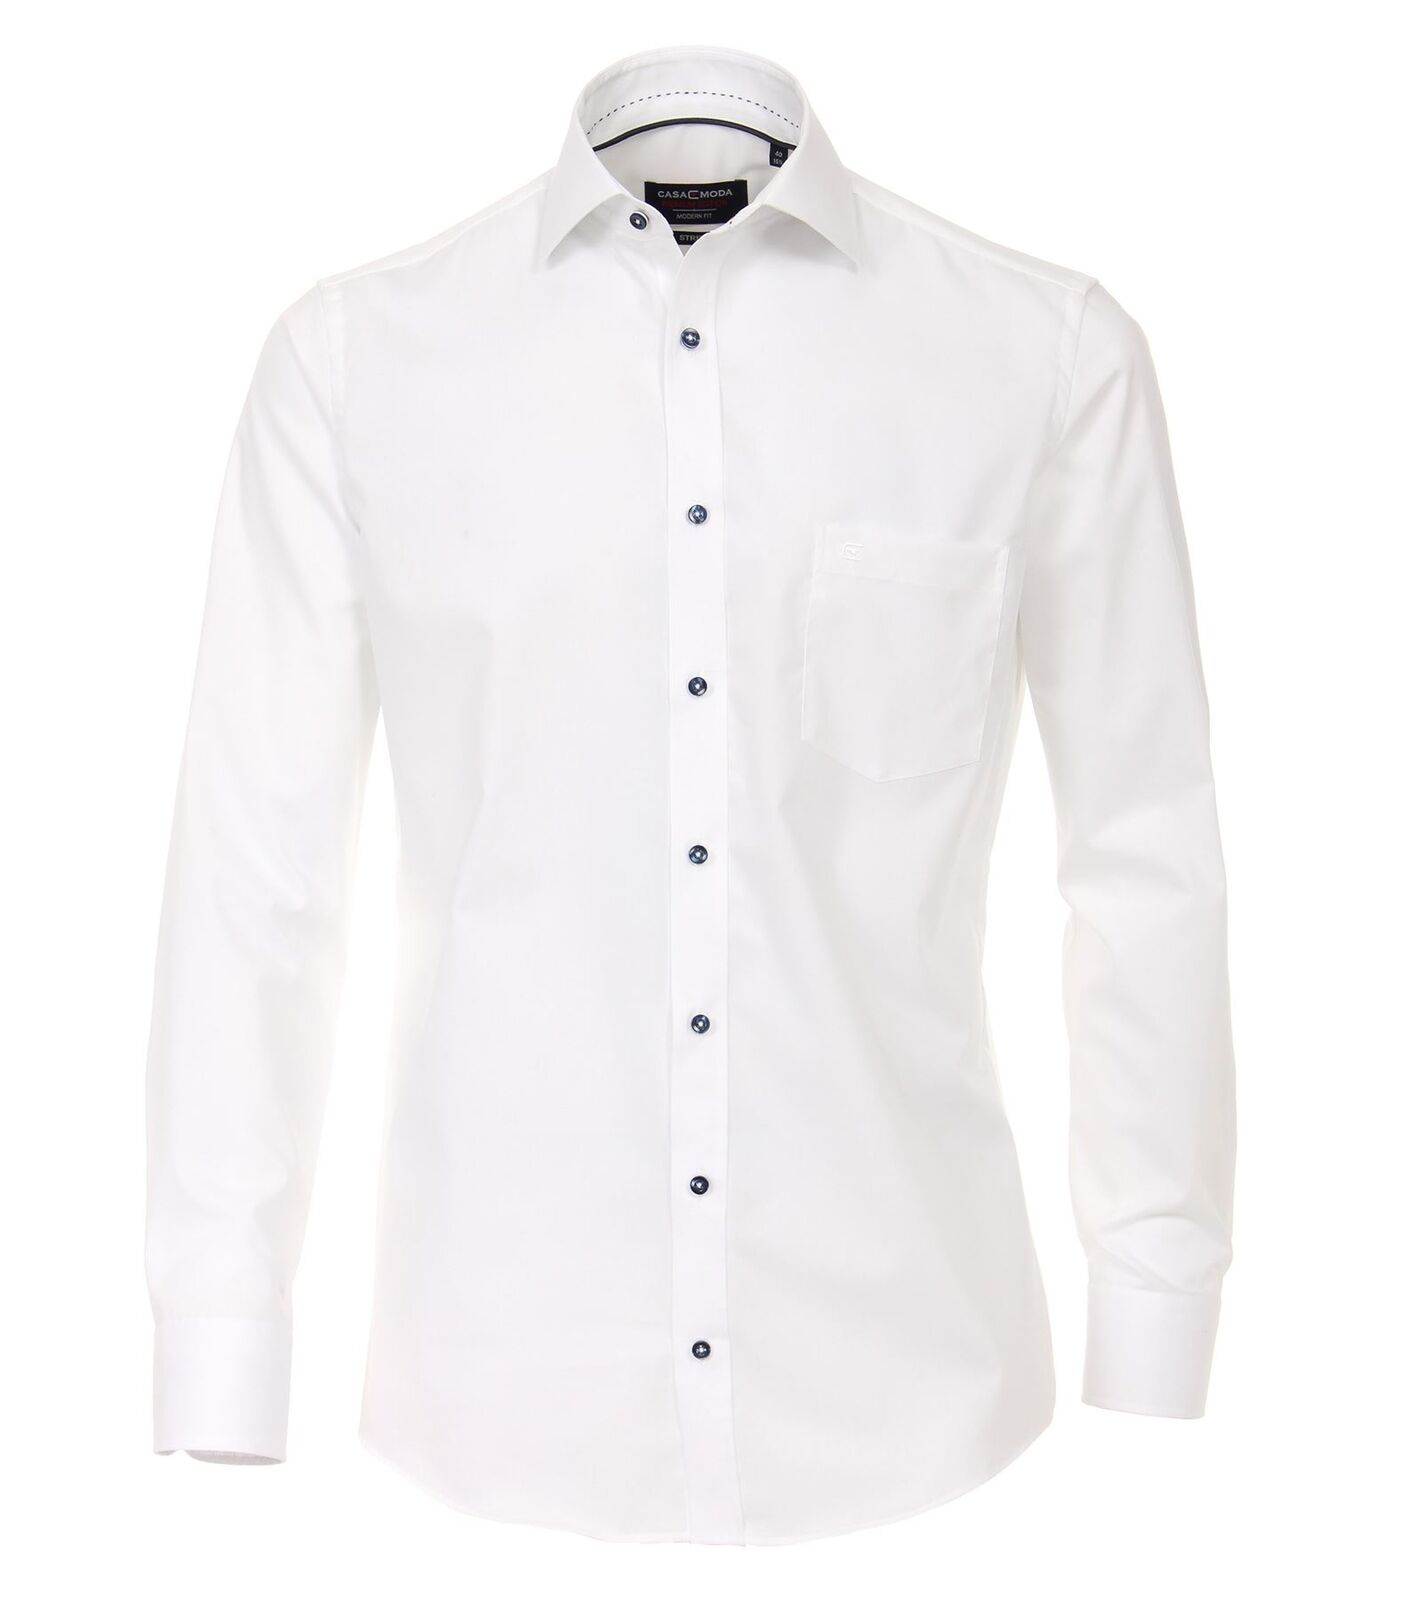 Casa Moda Mens modern fit long sleeved plain city shirt with cutaway collar